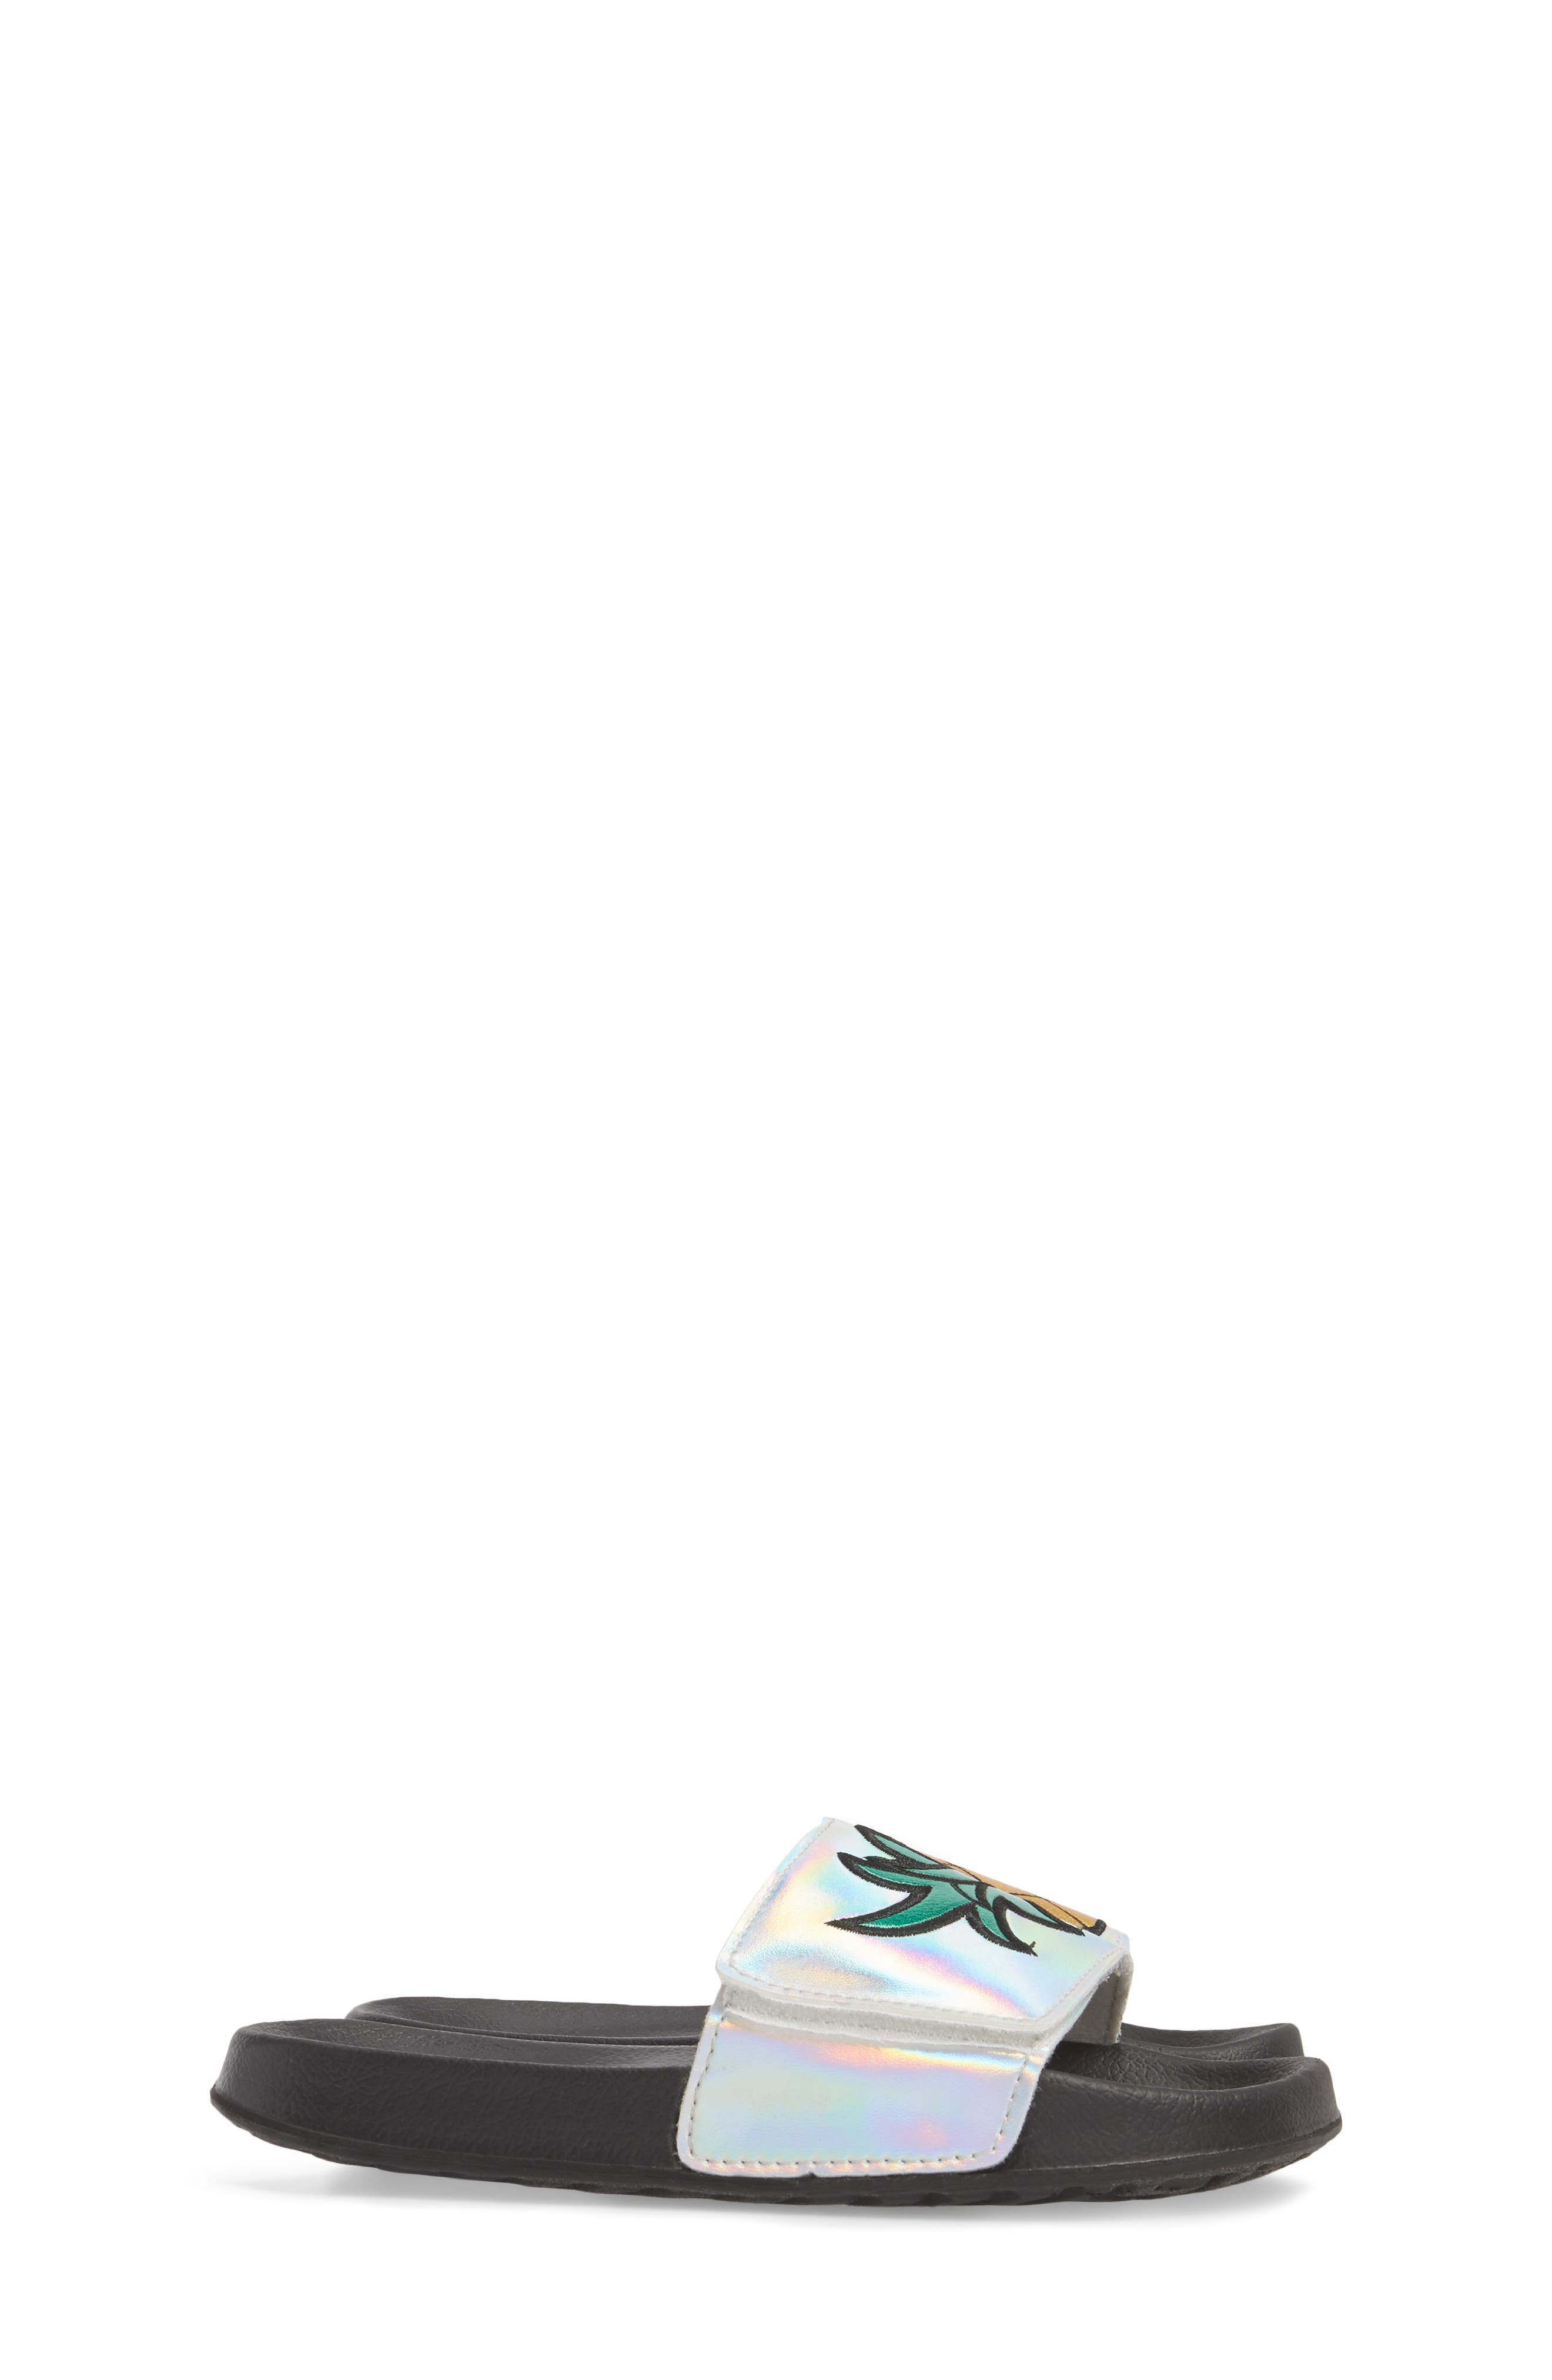 Alternate Image 4  - Sam Edelman Mackie Pineapple Metallic Slide Sandal (Toddler, Little Kid & Big Kid)